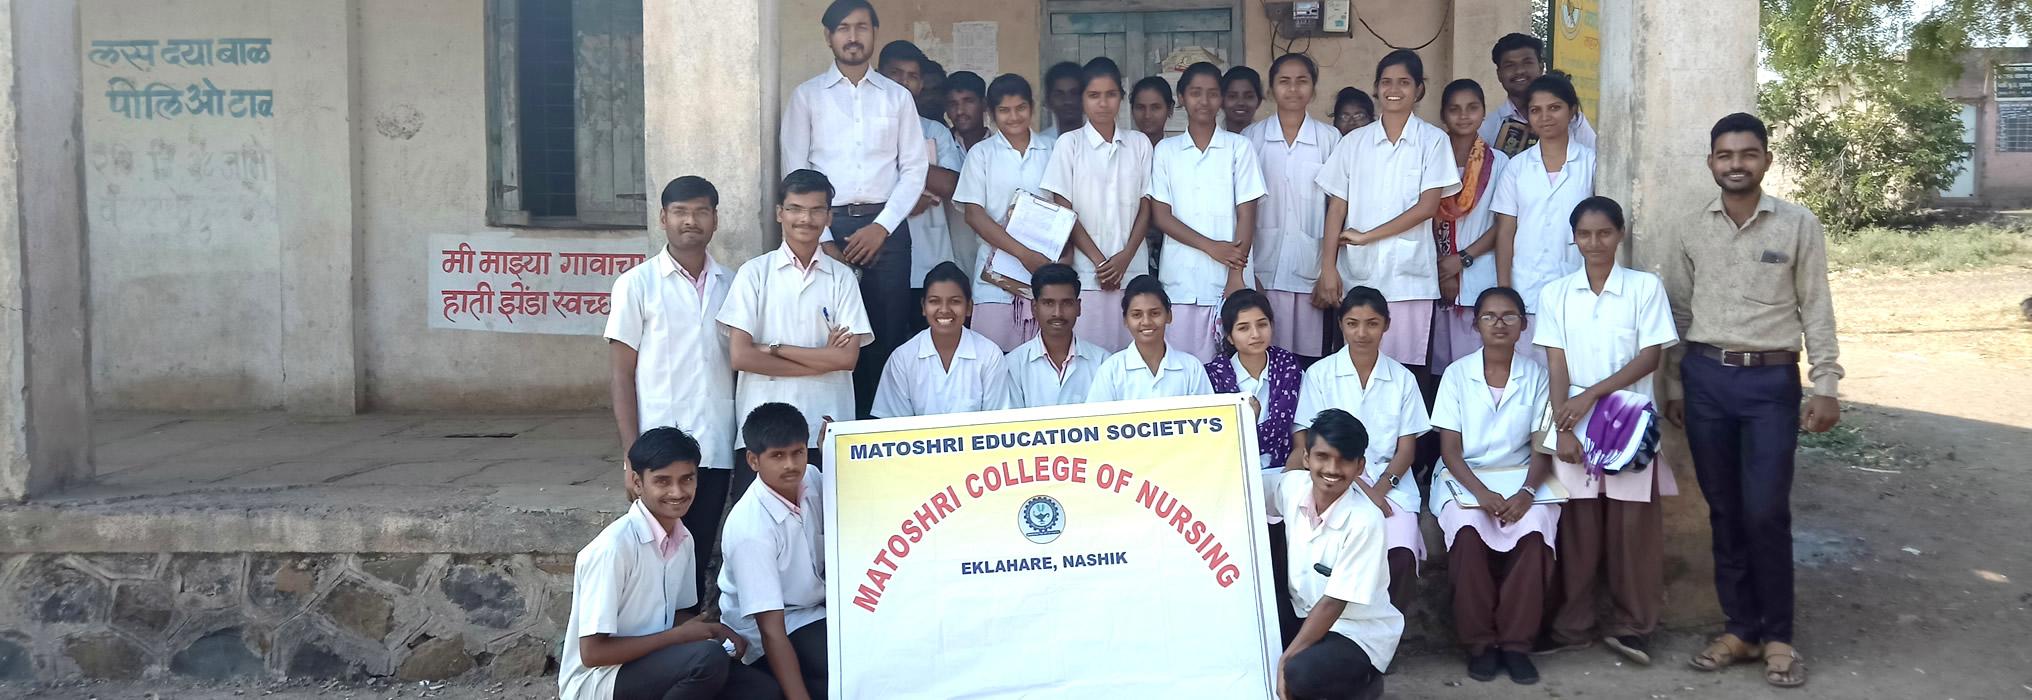 Matoshri College Of Nursing, Nashik Image